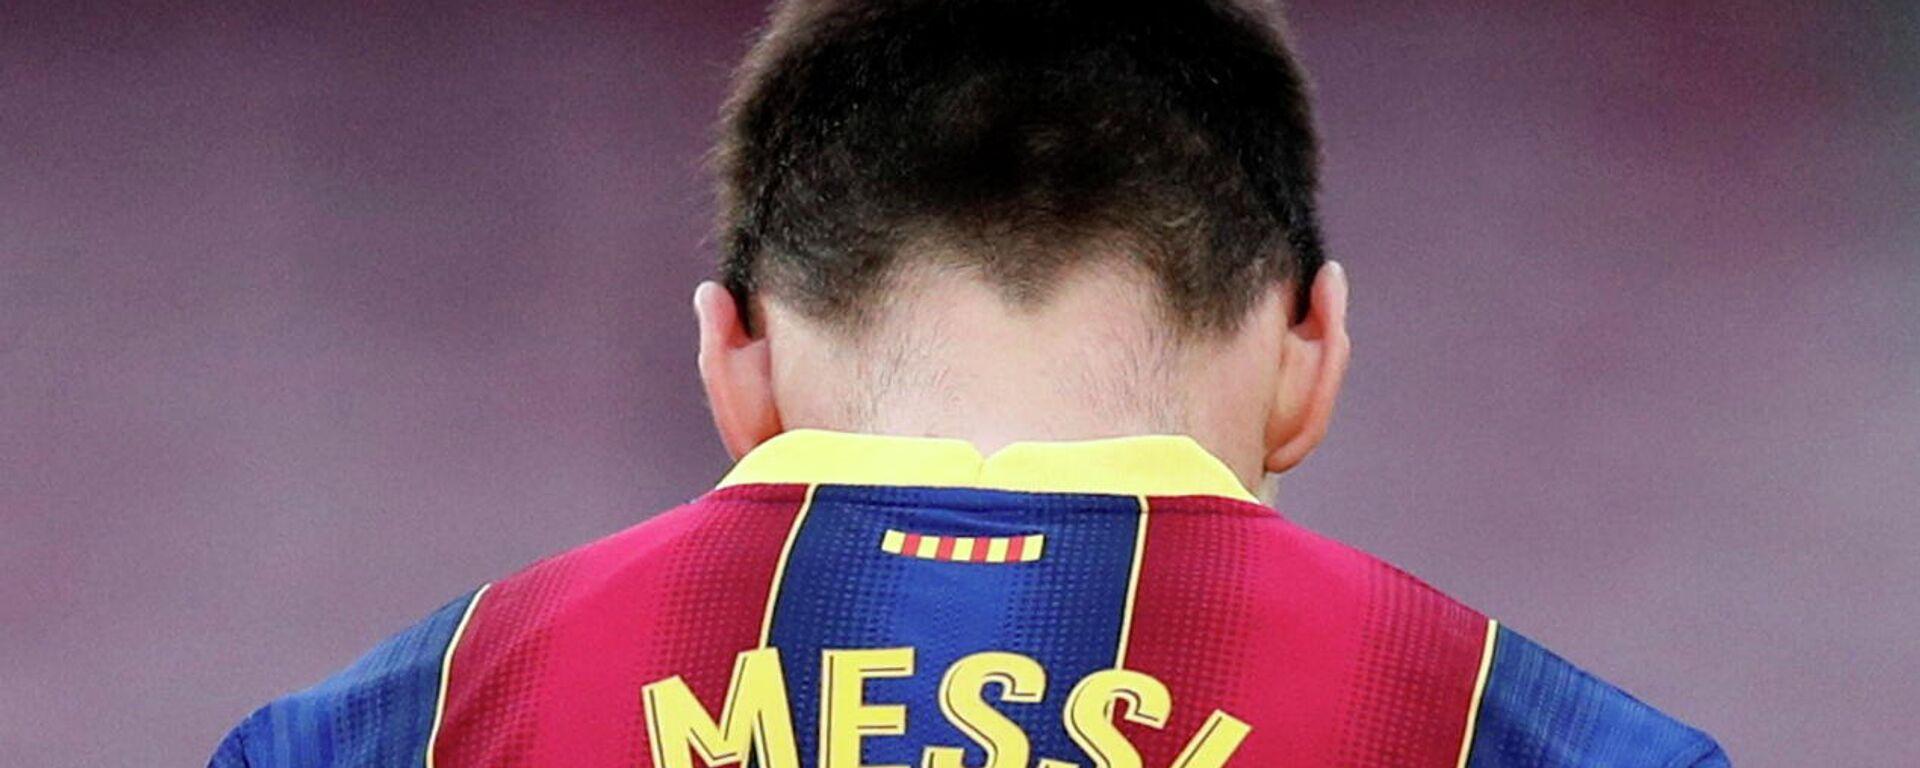 Lionel Messi, futbolista argentino exjugador del Fútbol Club Barcelona - Sputnik Mundo, 1920, 06.08.2021